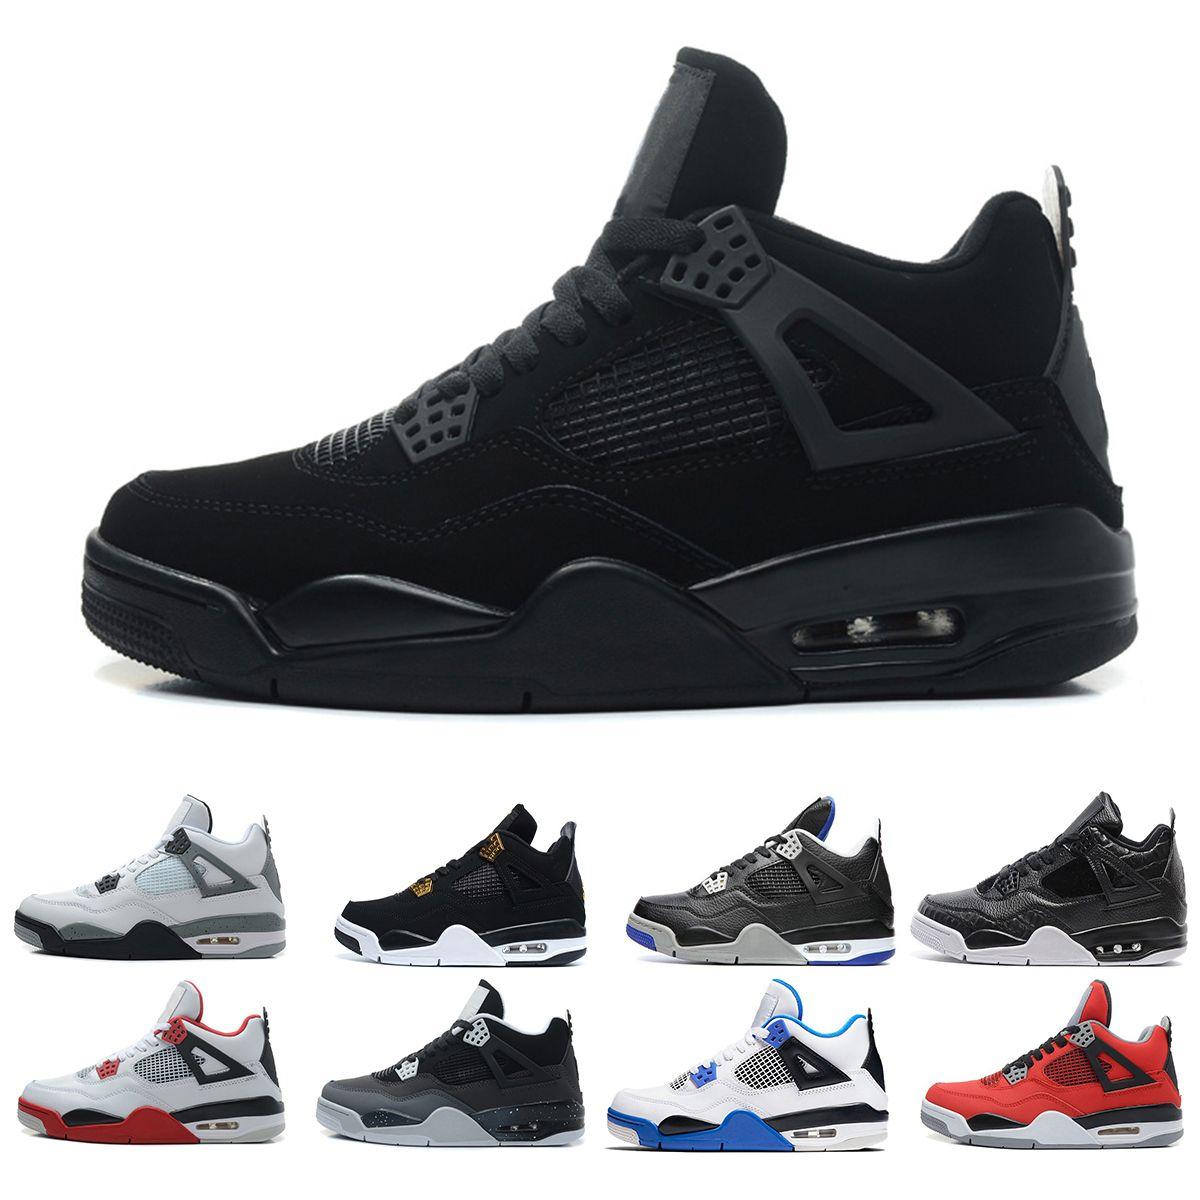 detailed look e68bc dd89f Großhandel Herrenschuhe Black Cat Basketball Schuhe Herren 4s Alternate 89  Premium Schwarzes CAVS Oreo Toro Bravo Sneakers Outdoor Sports Sneakers Von  ...